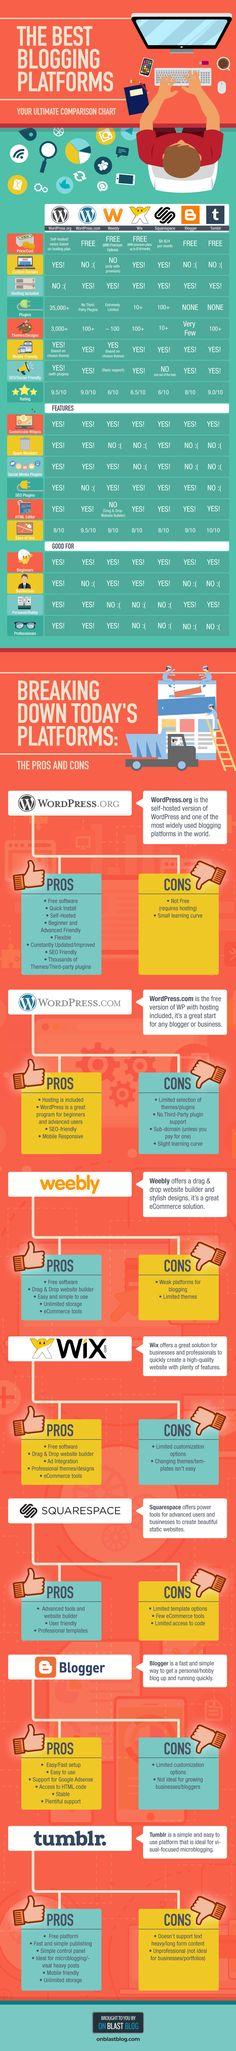 best blogging platforms breakdown